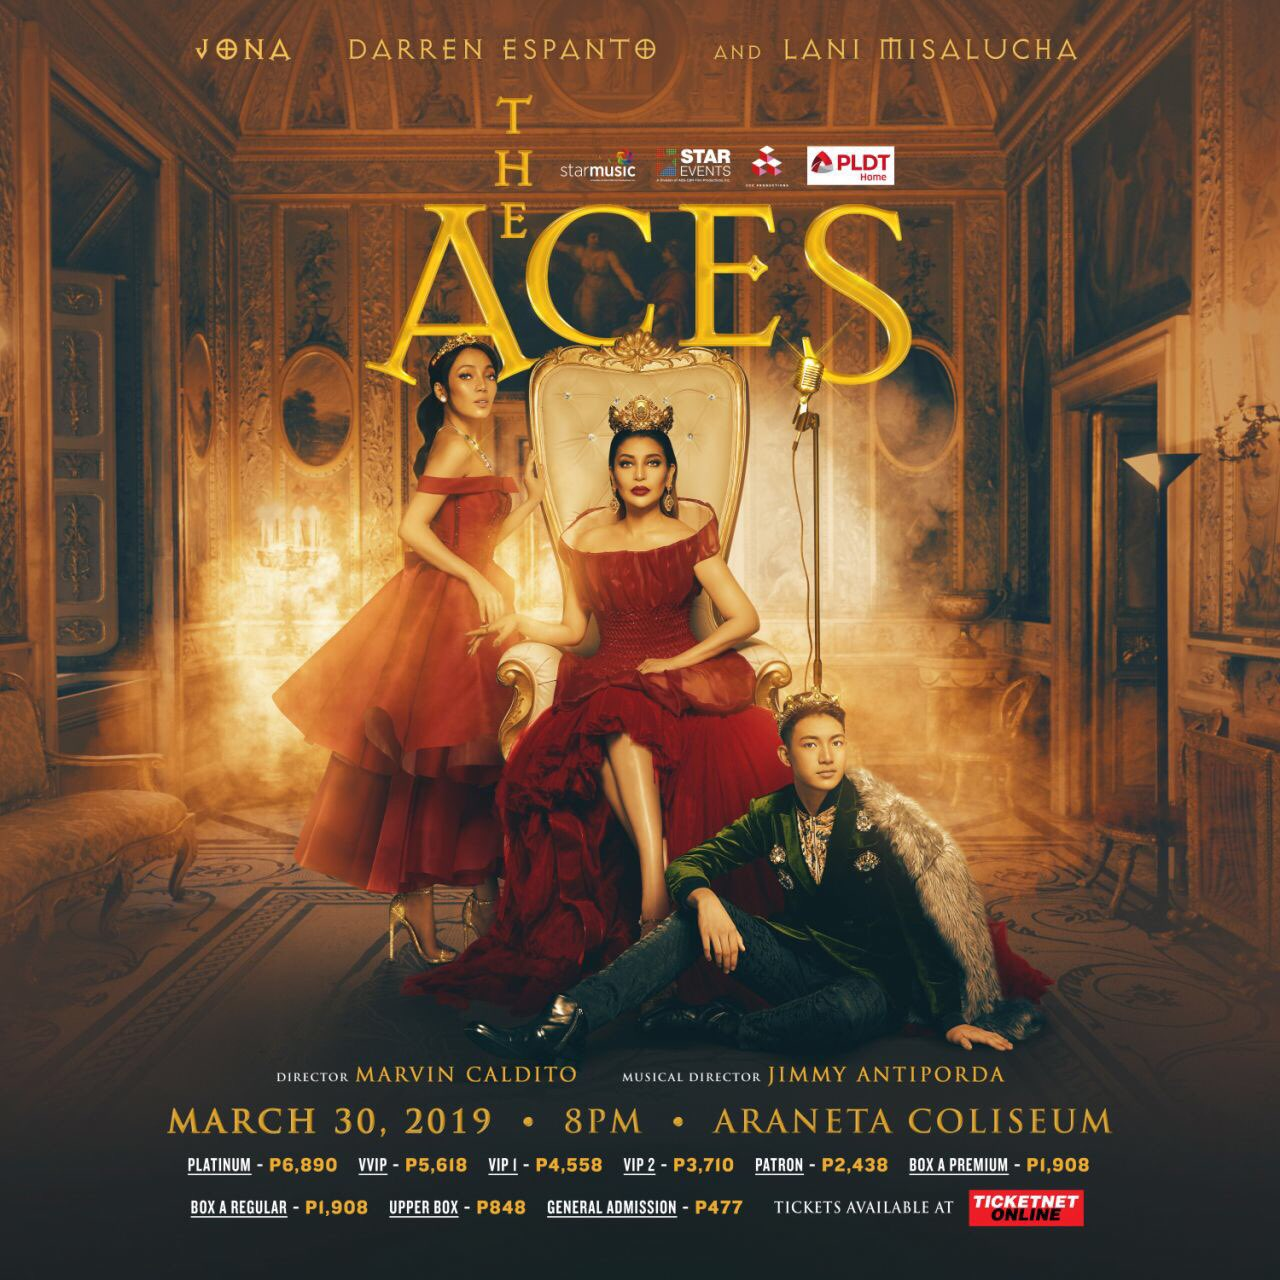 The ACES Concert with Jona, Darren Espanto, and Lani Misalucha